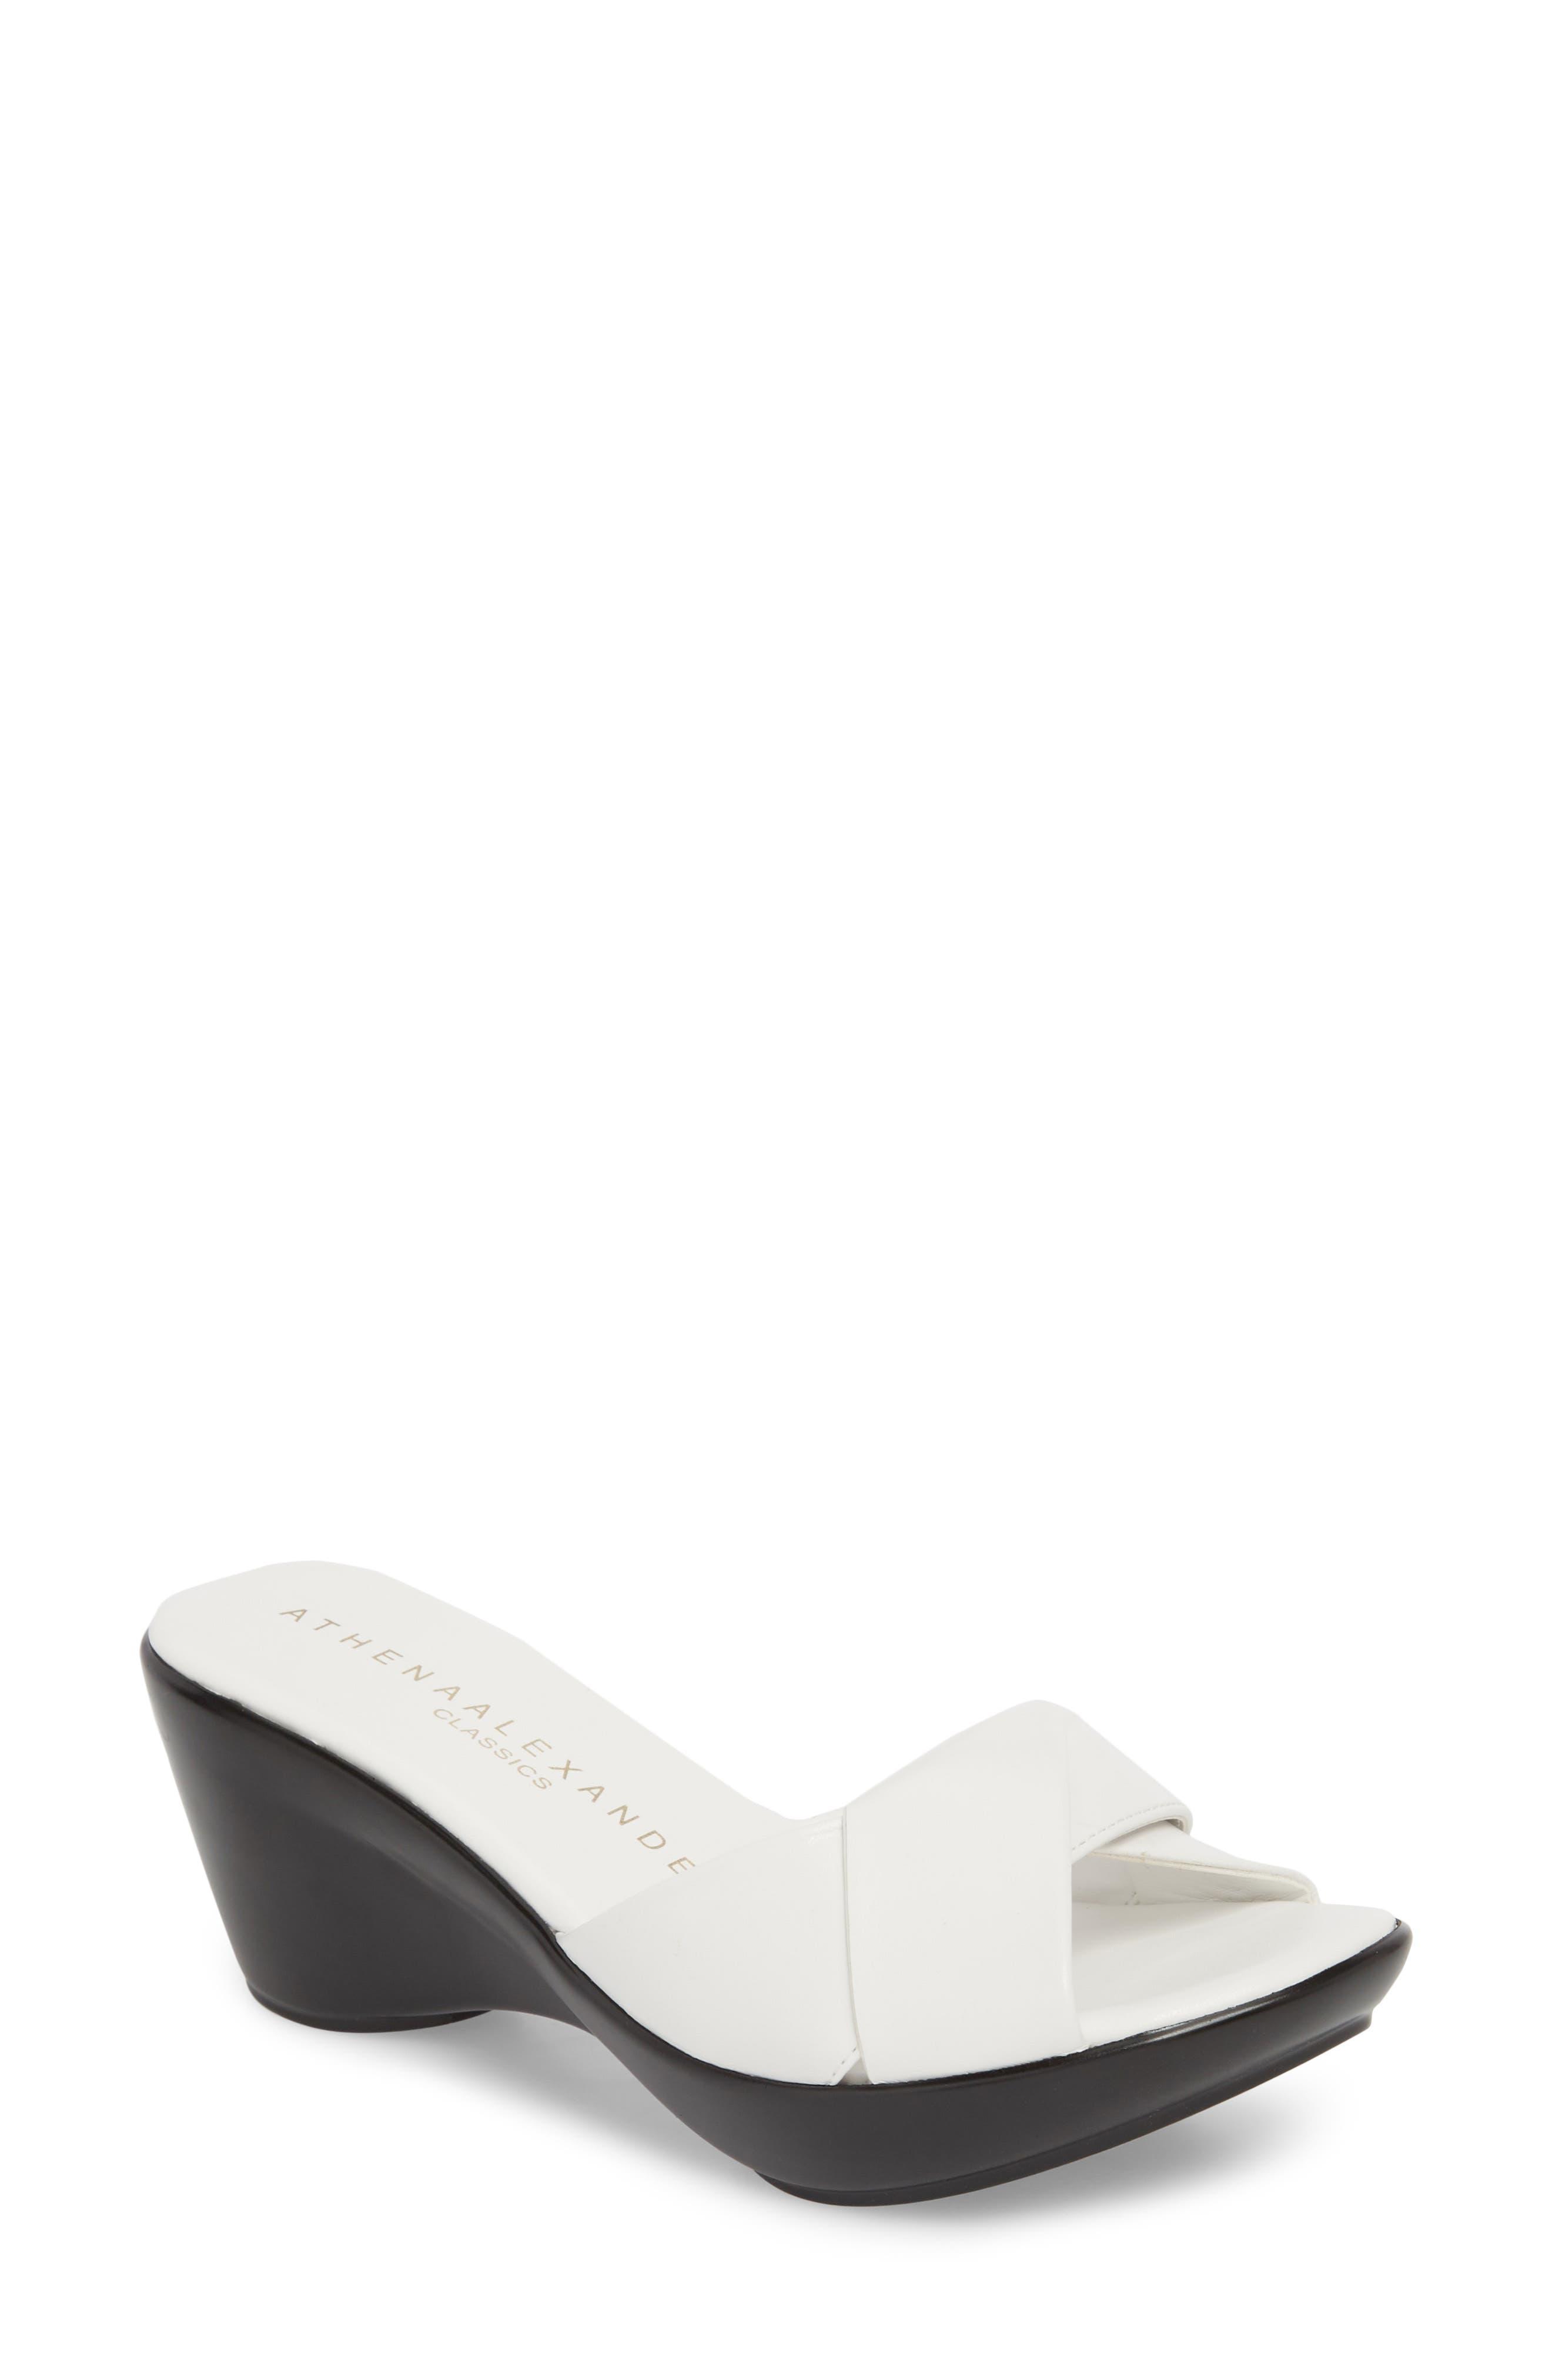 Athena Alexander Orlando Slide Sandal- White